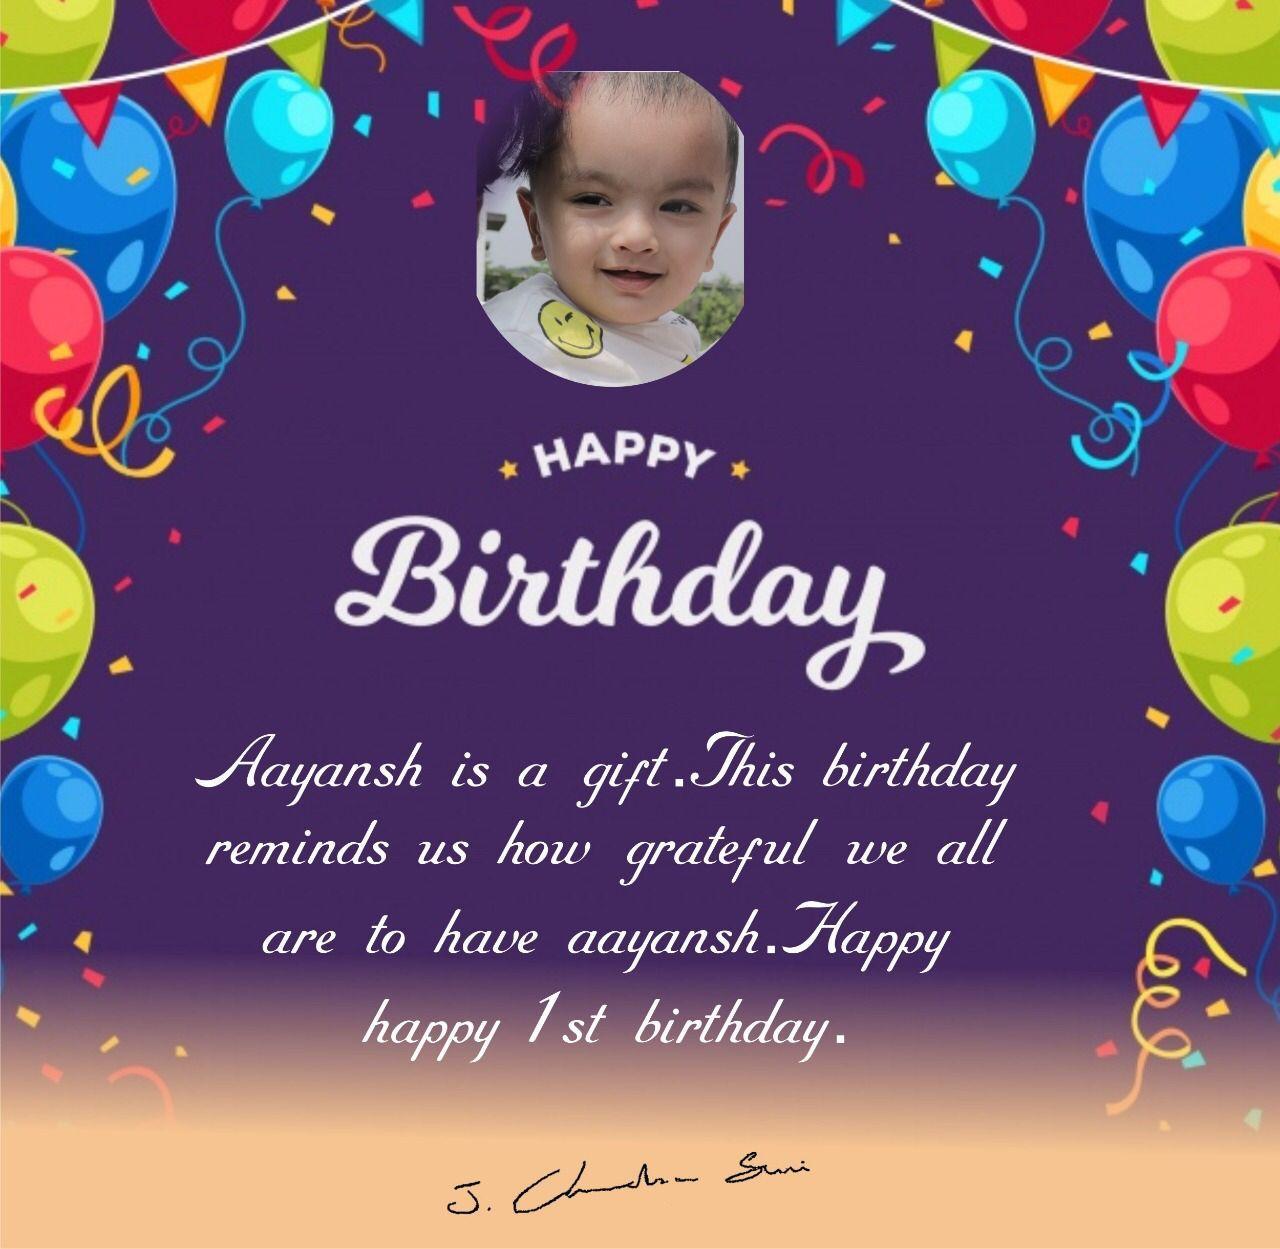 Aayansh 1st Birthday Banner Design Birthday 1st Birthday